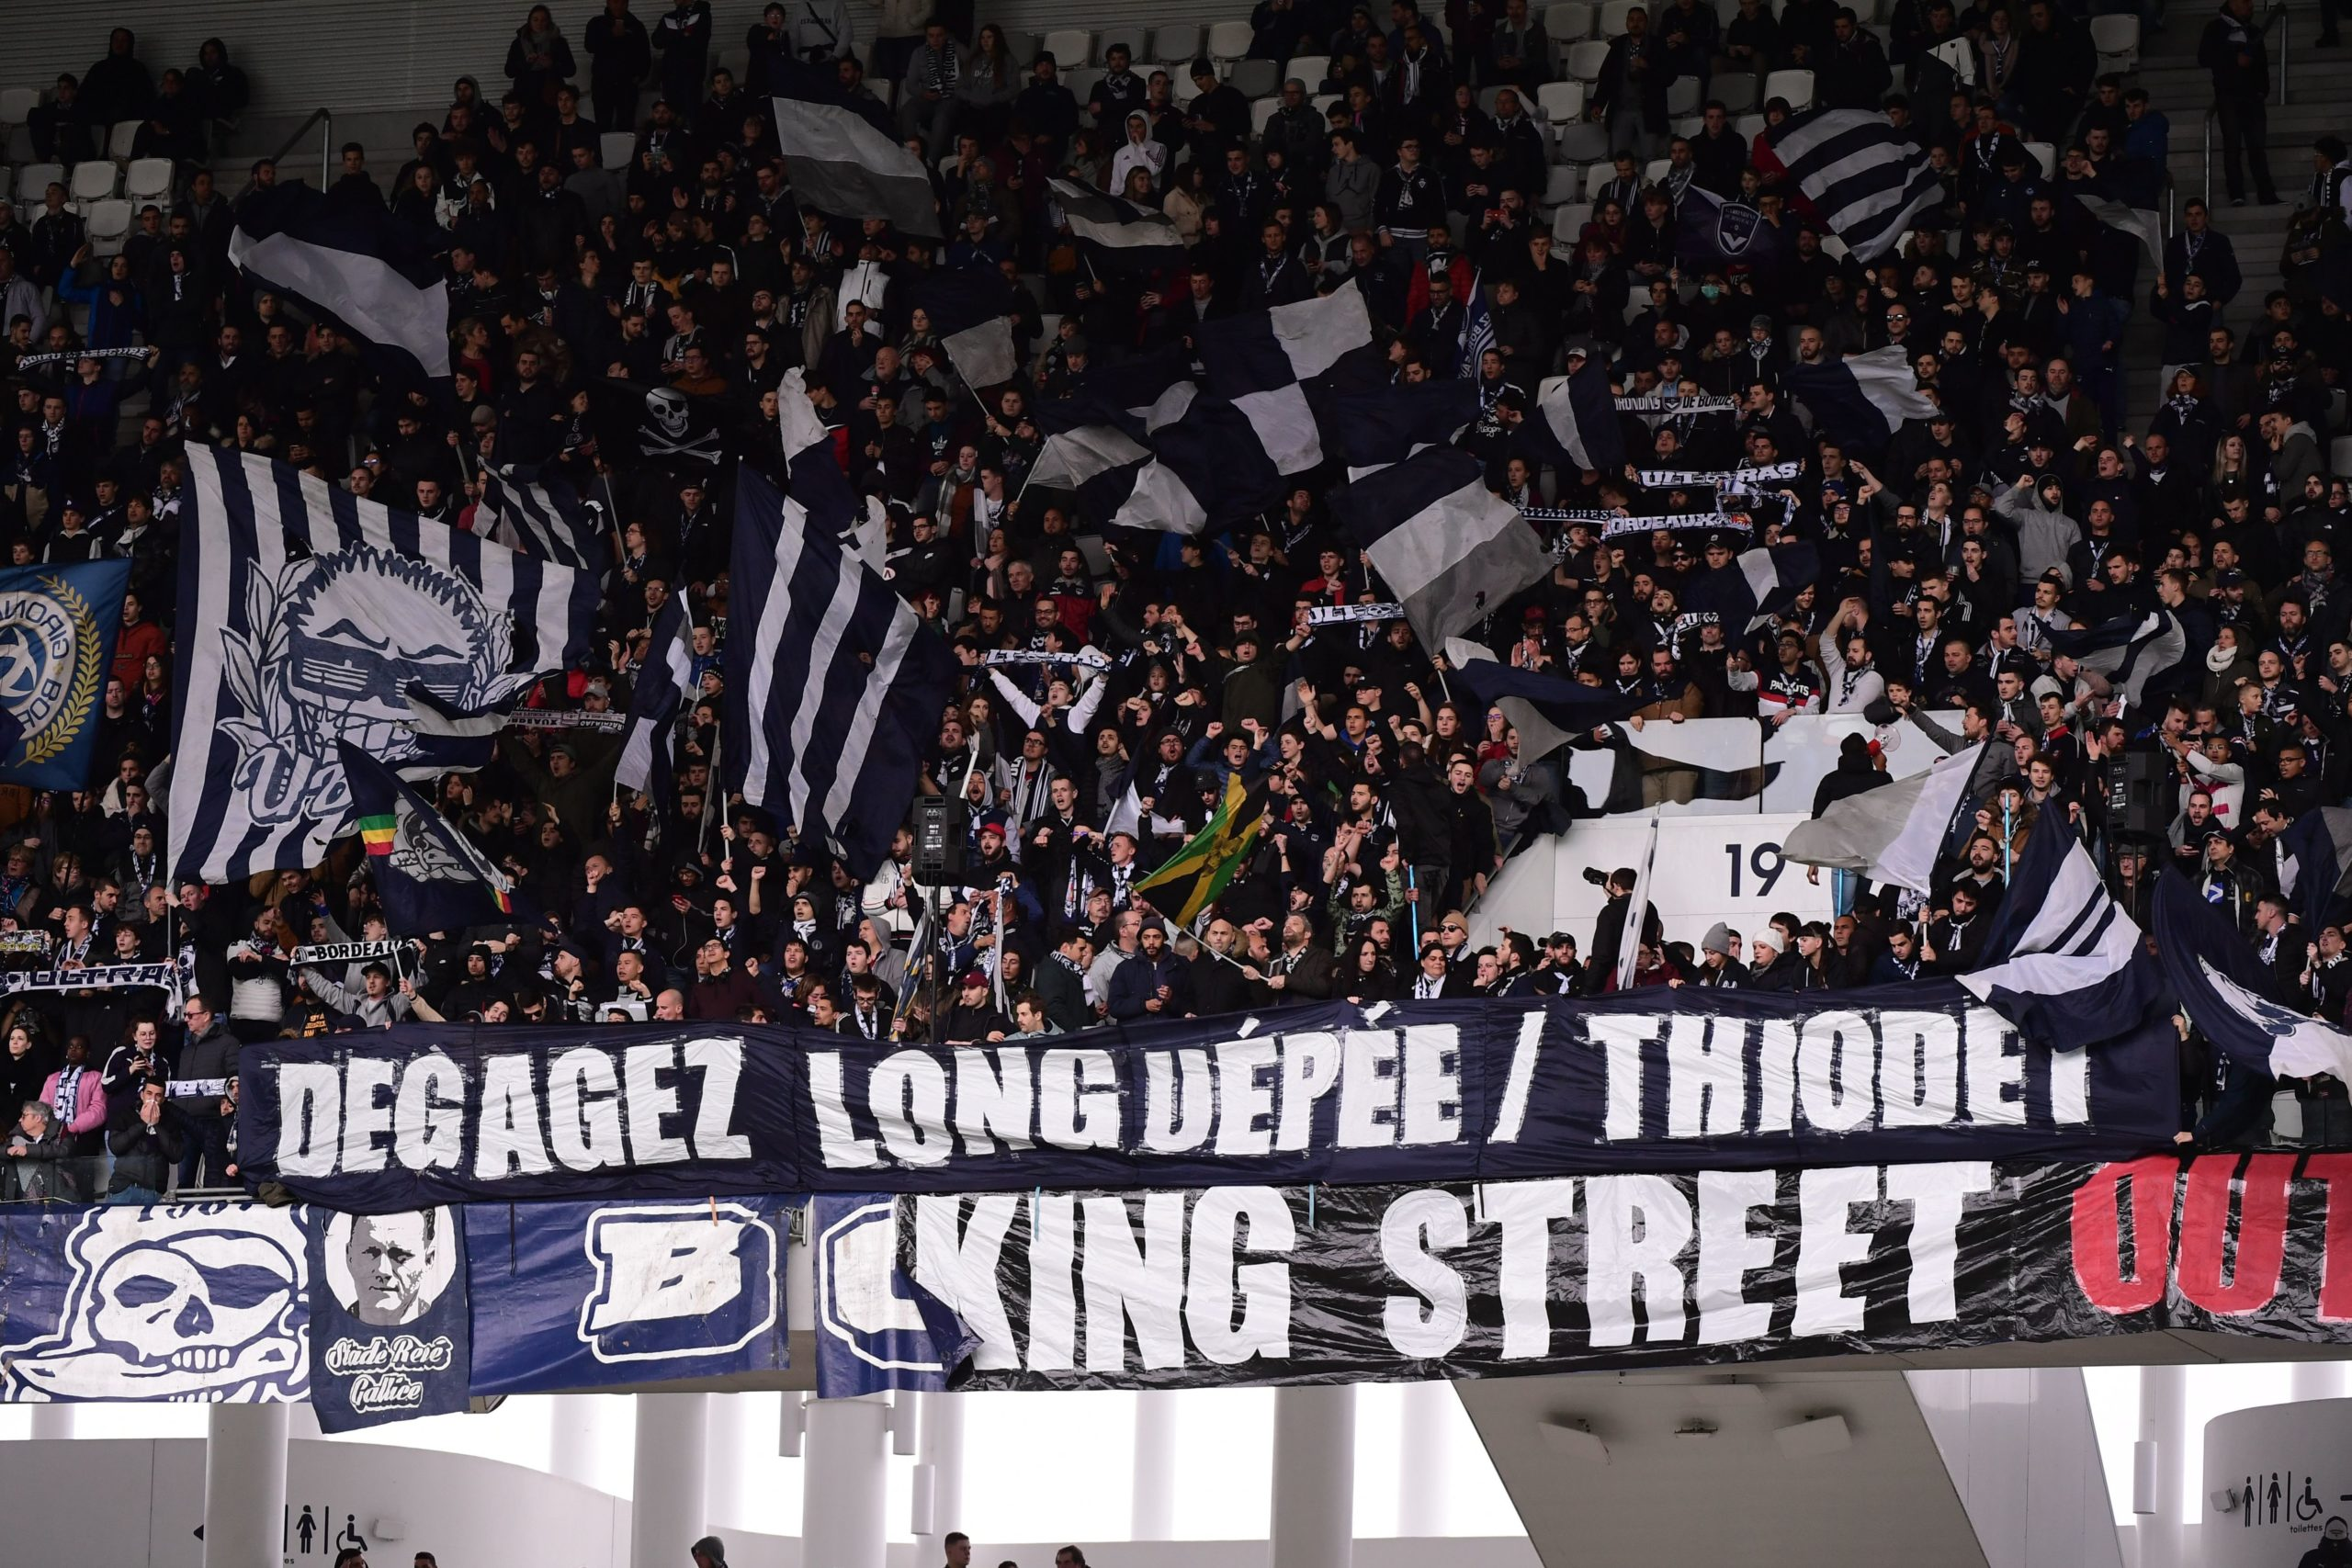 supporters longuepée thiodet king street ultras, ultramarines